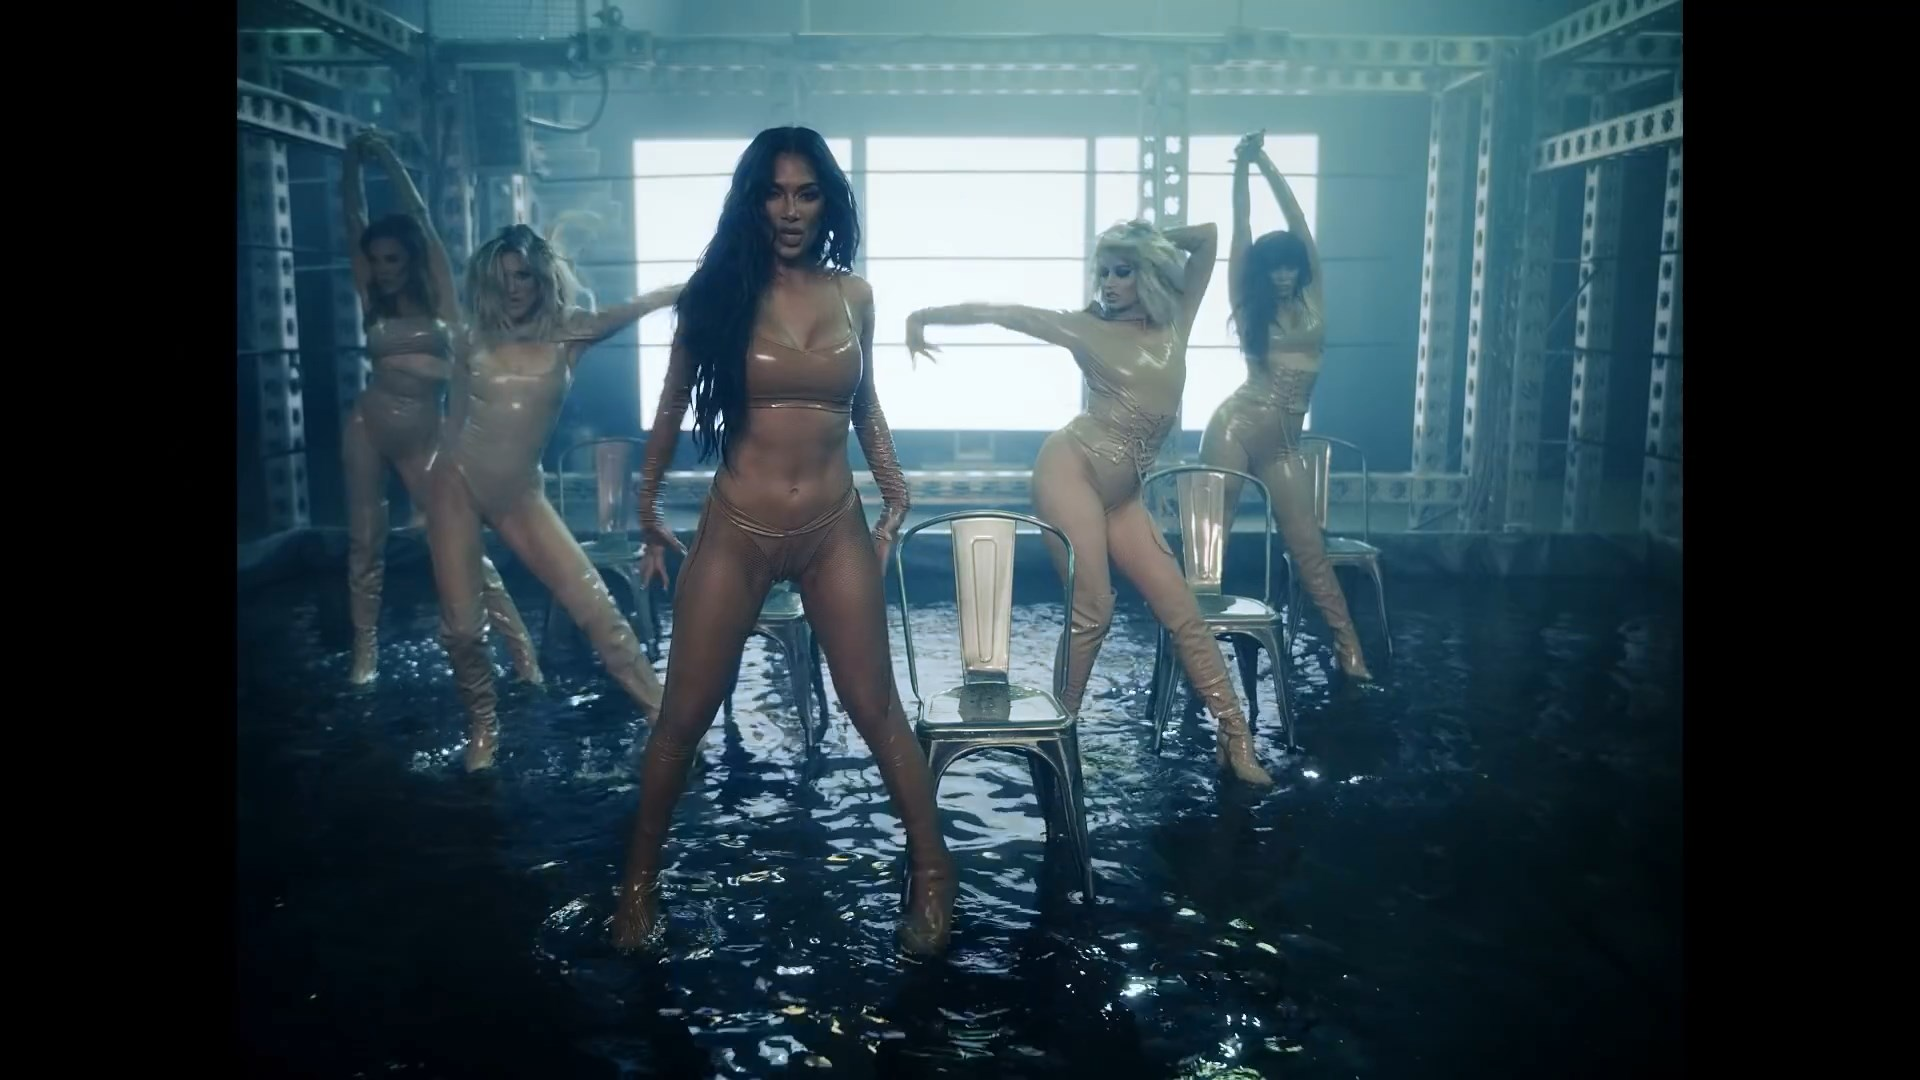 The Pussycat Dolls - React.mp4_snapshot_02.44_[2020.02.10_03.43.35].jpg